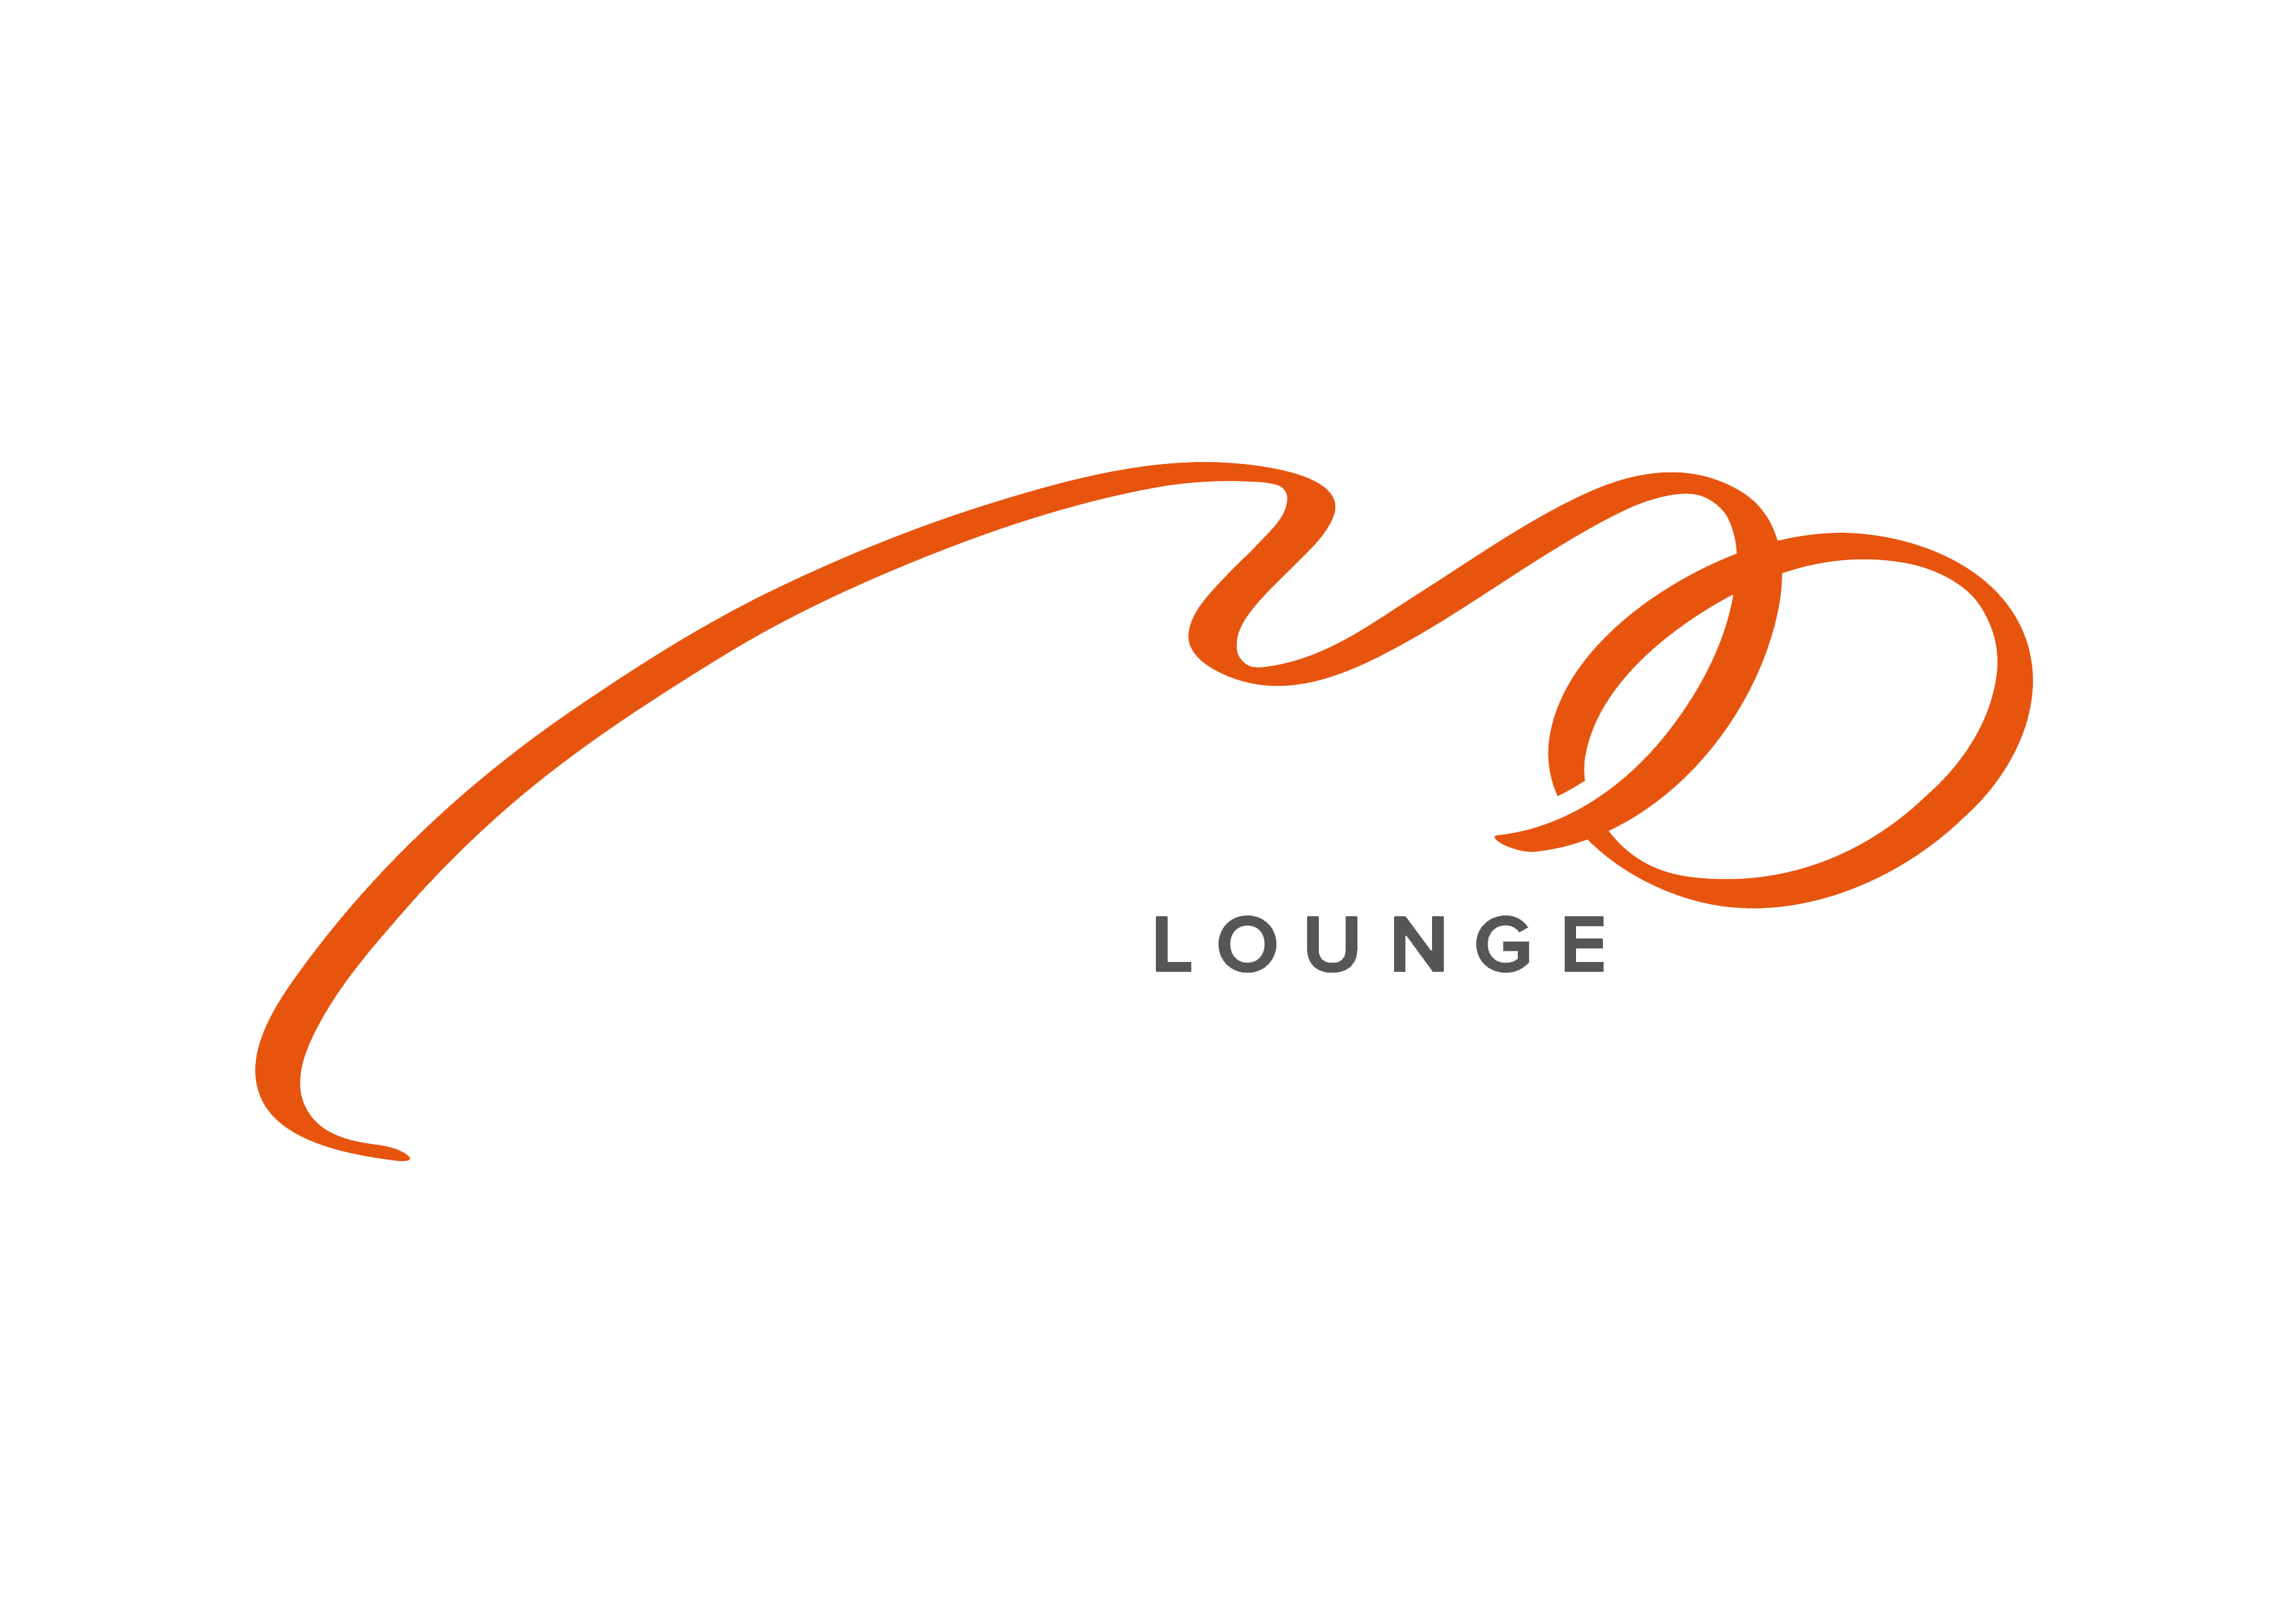 MO Lounge Official Logo